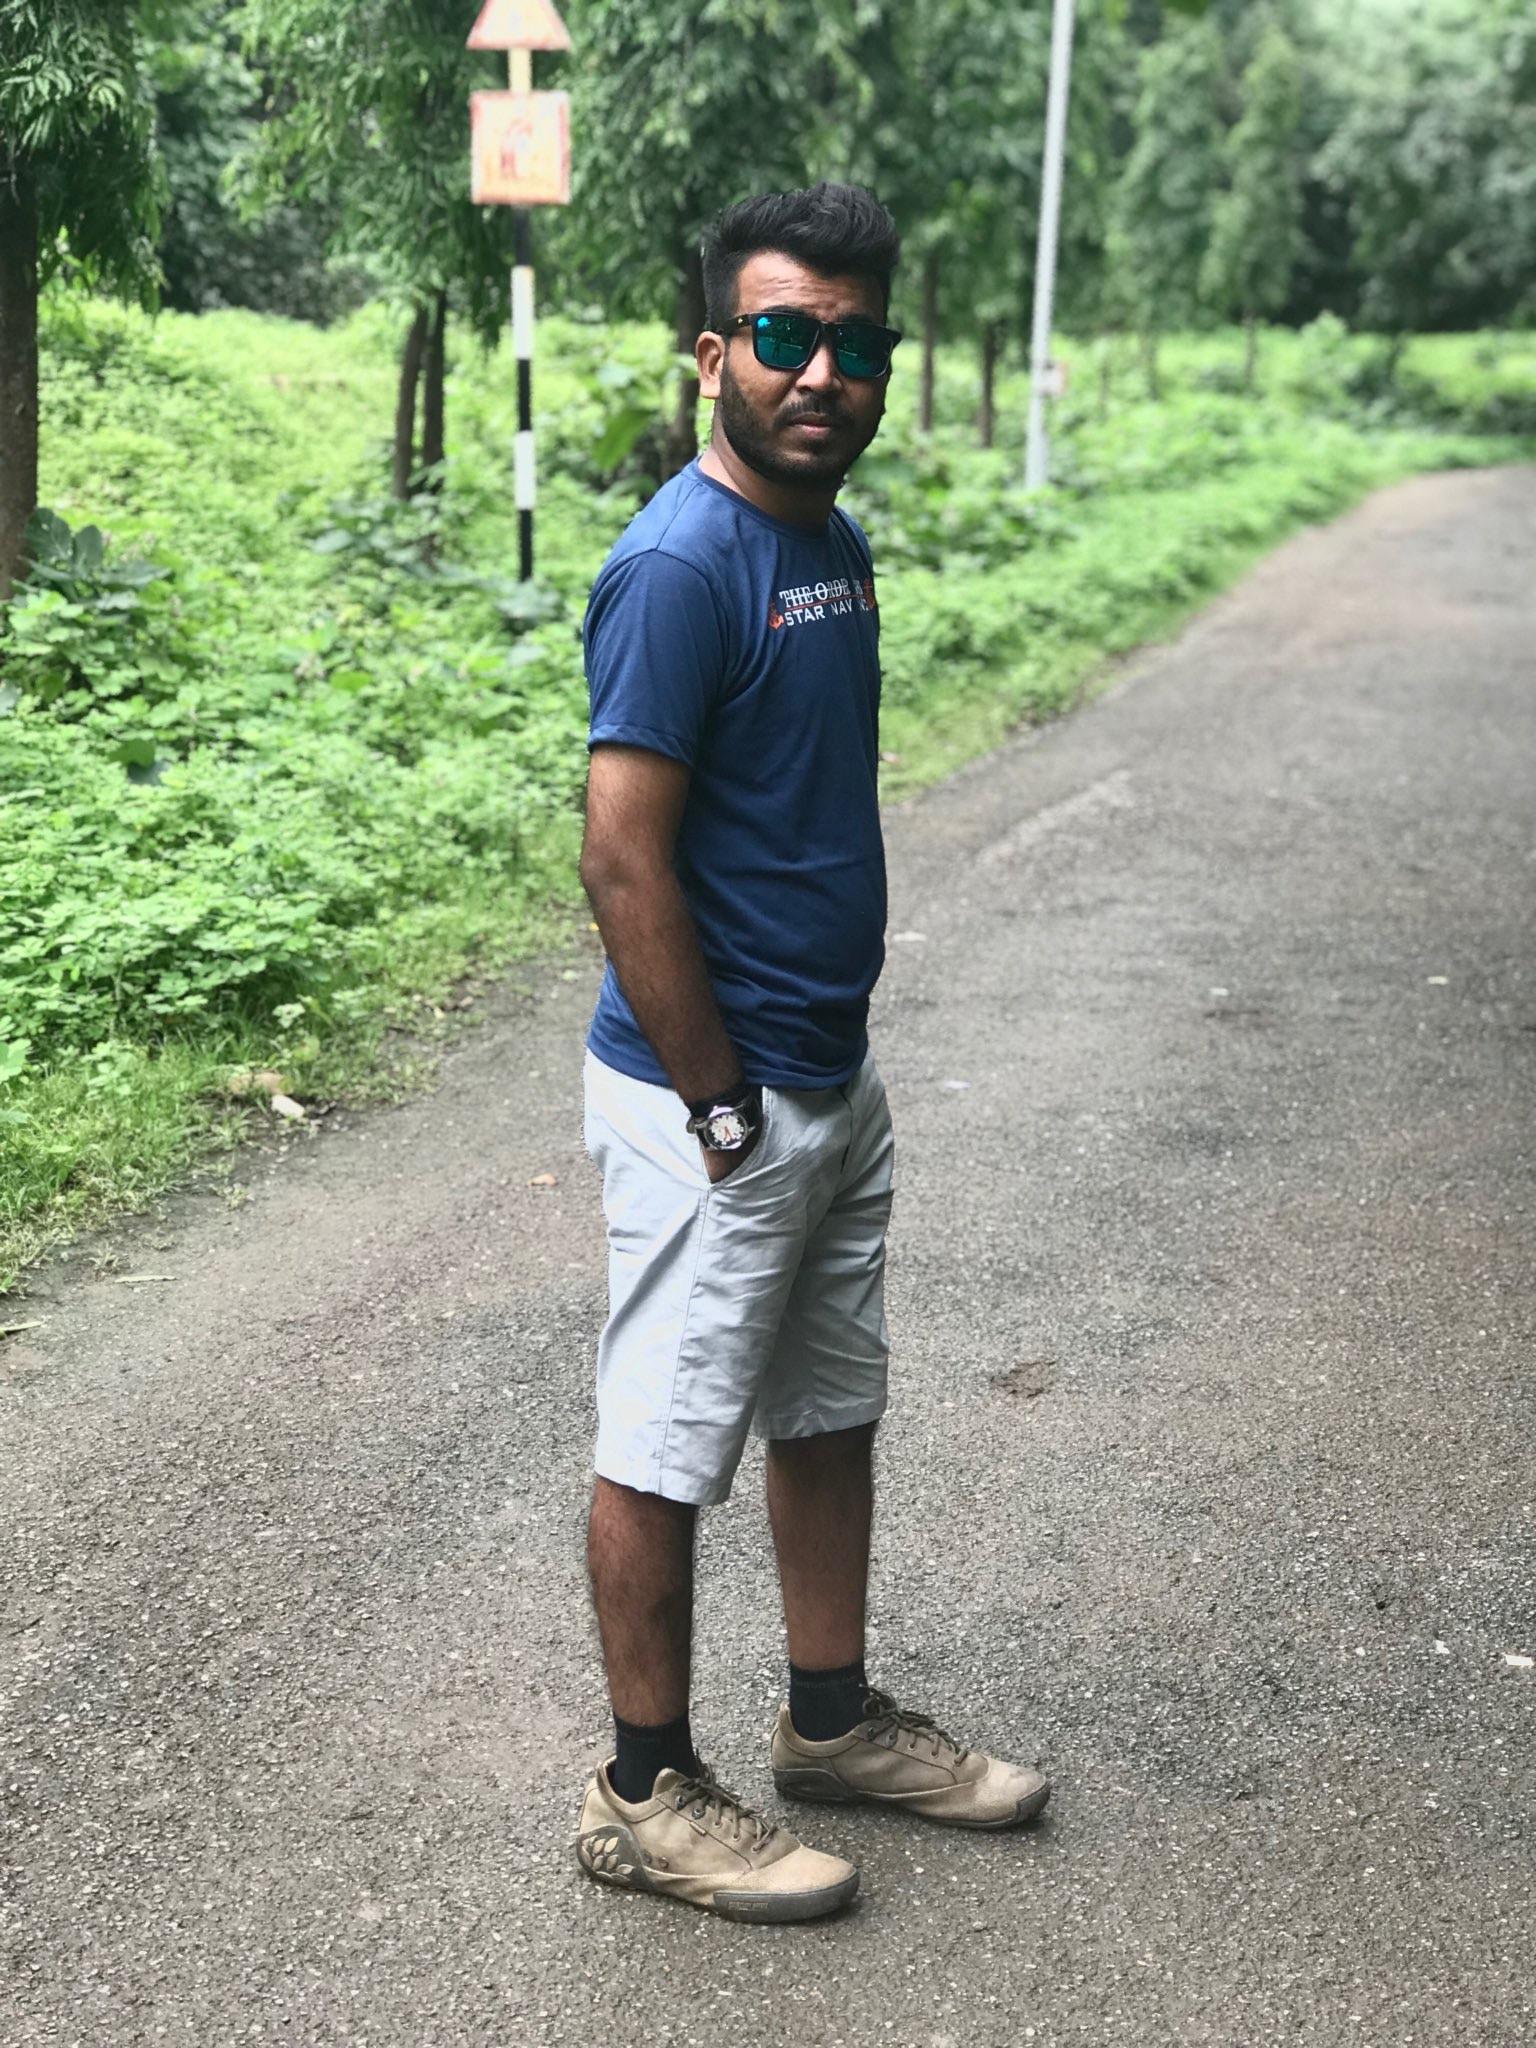 Go to BhAvik SuThar's profile